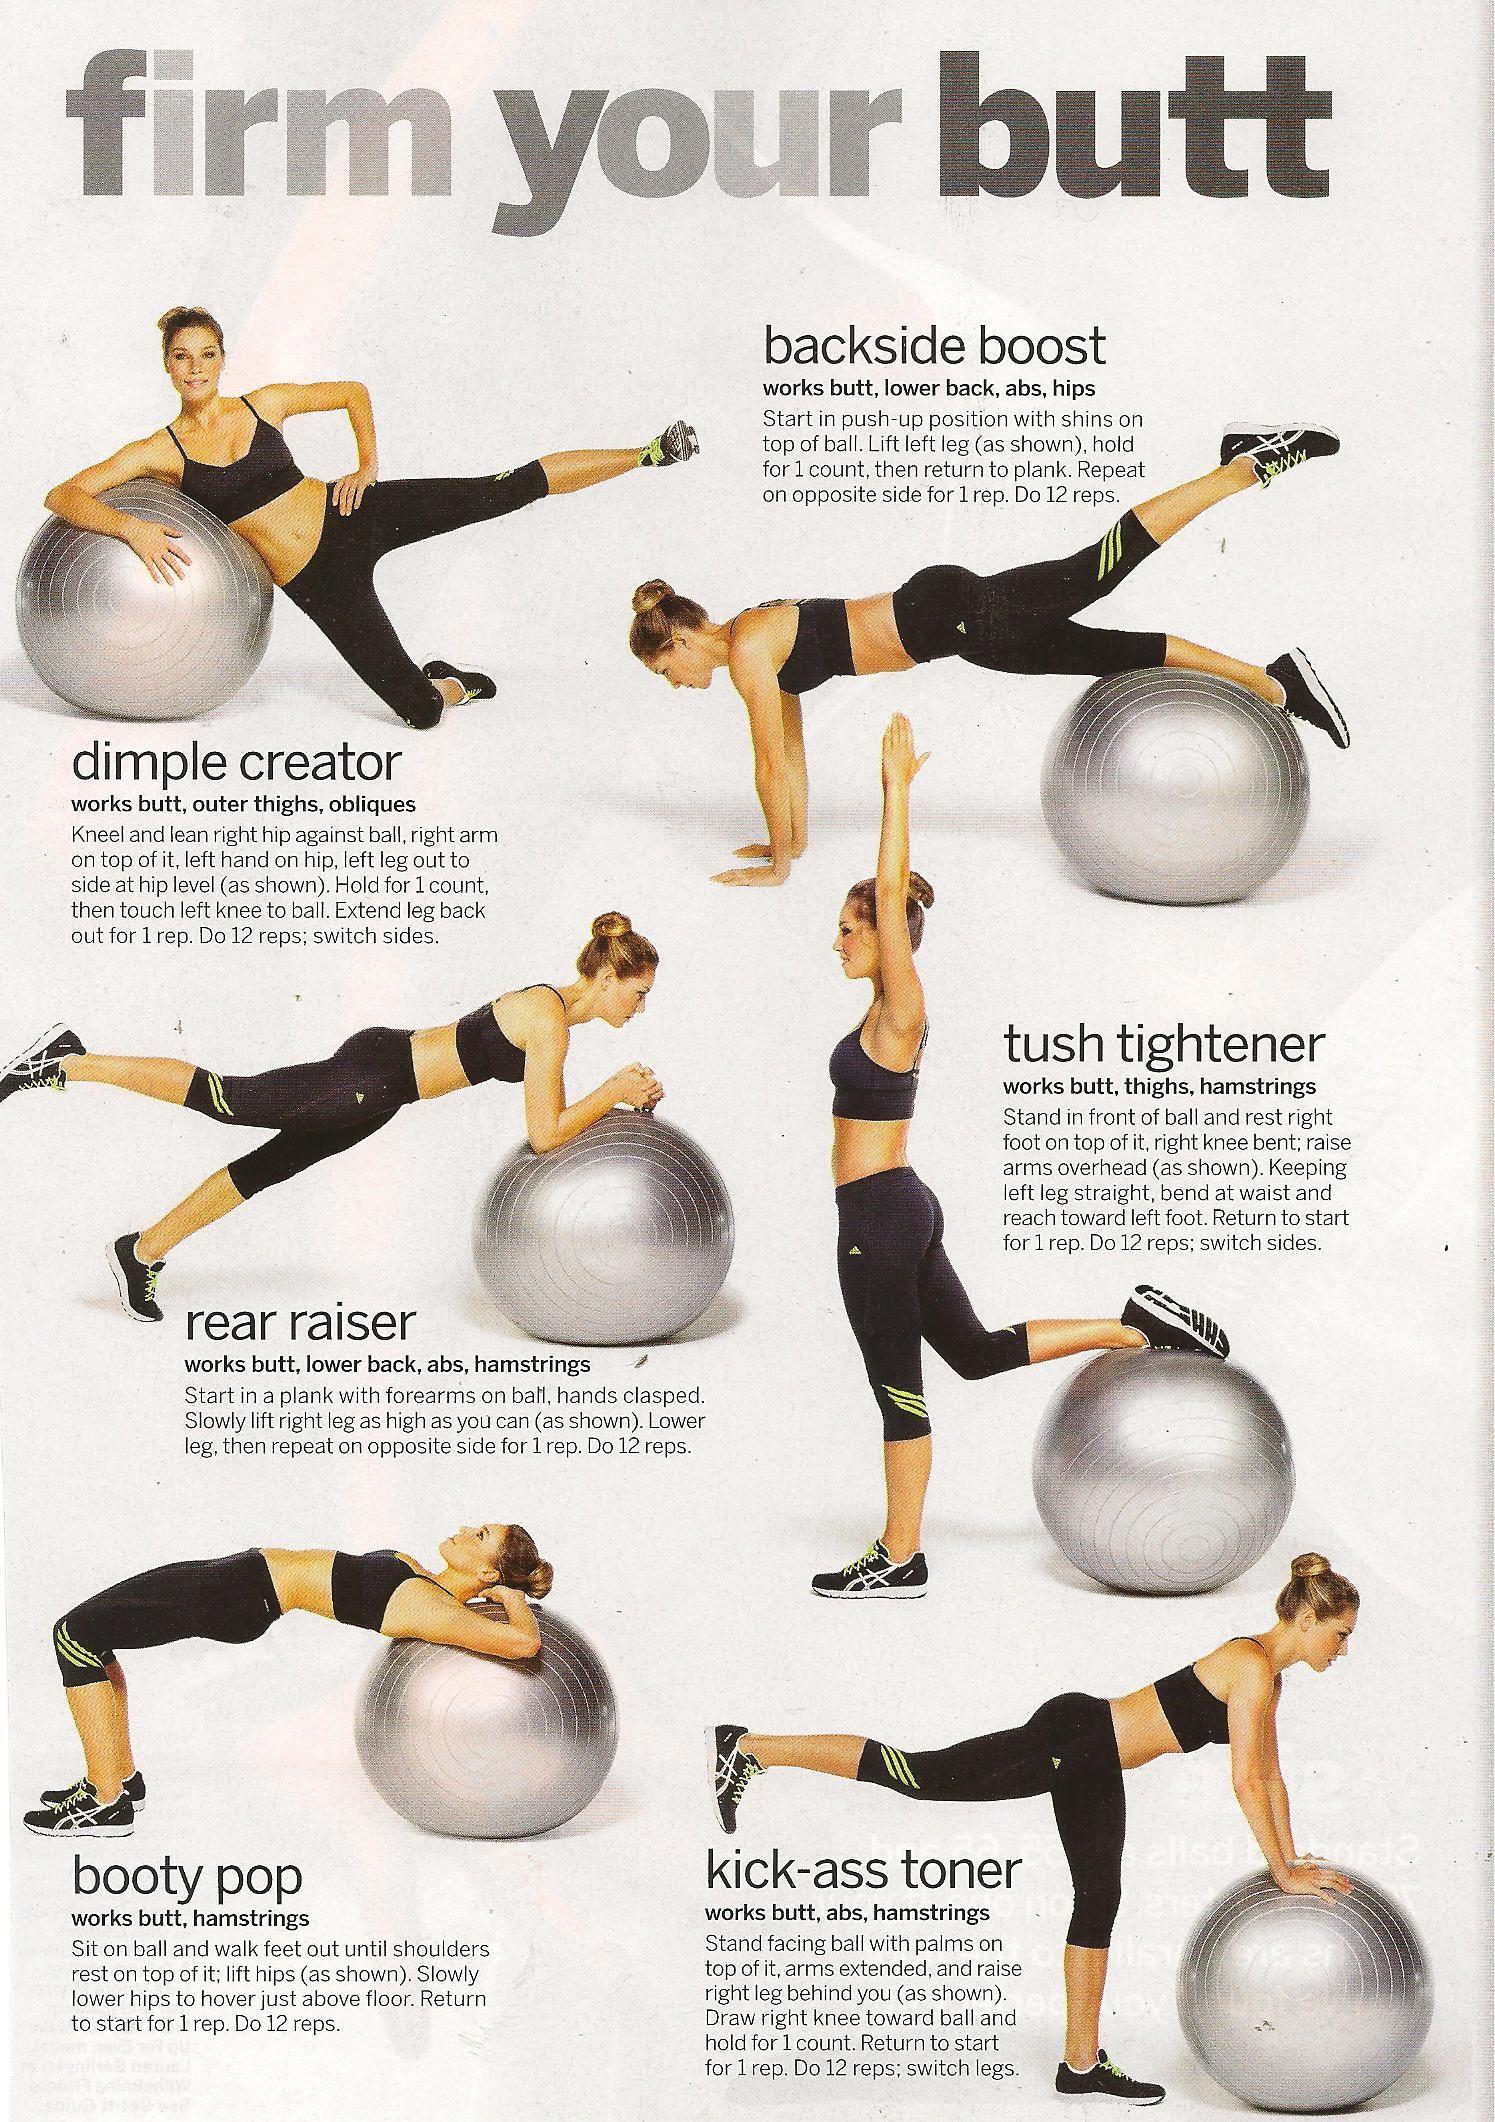 Exercise Improves Brain Function